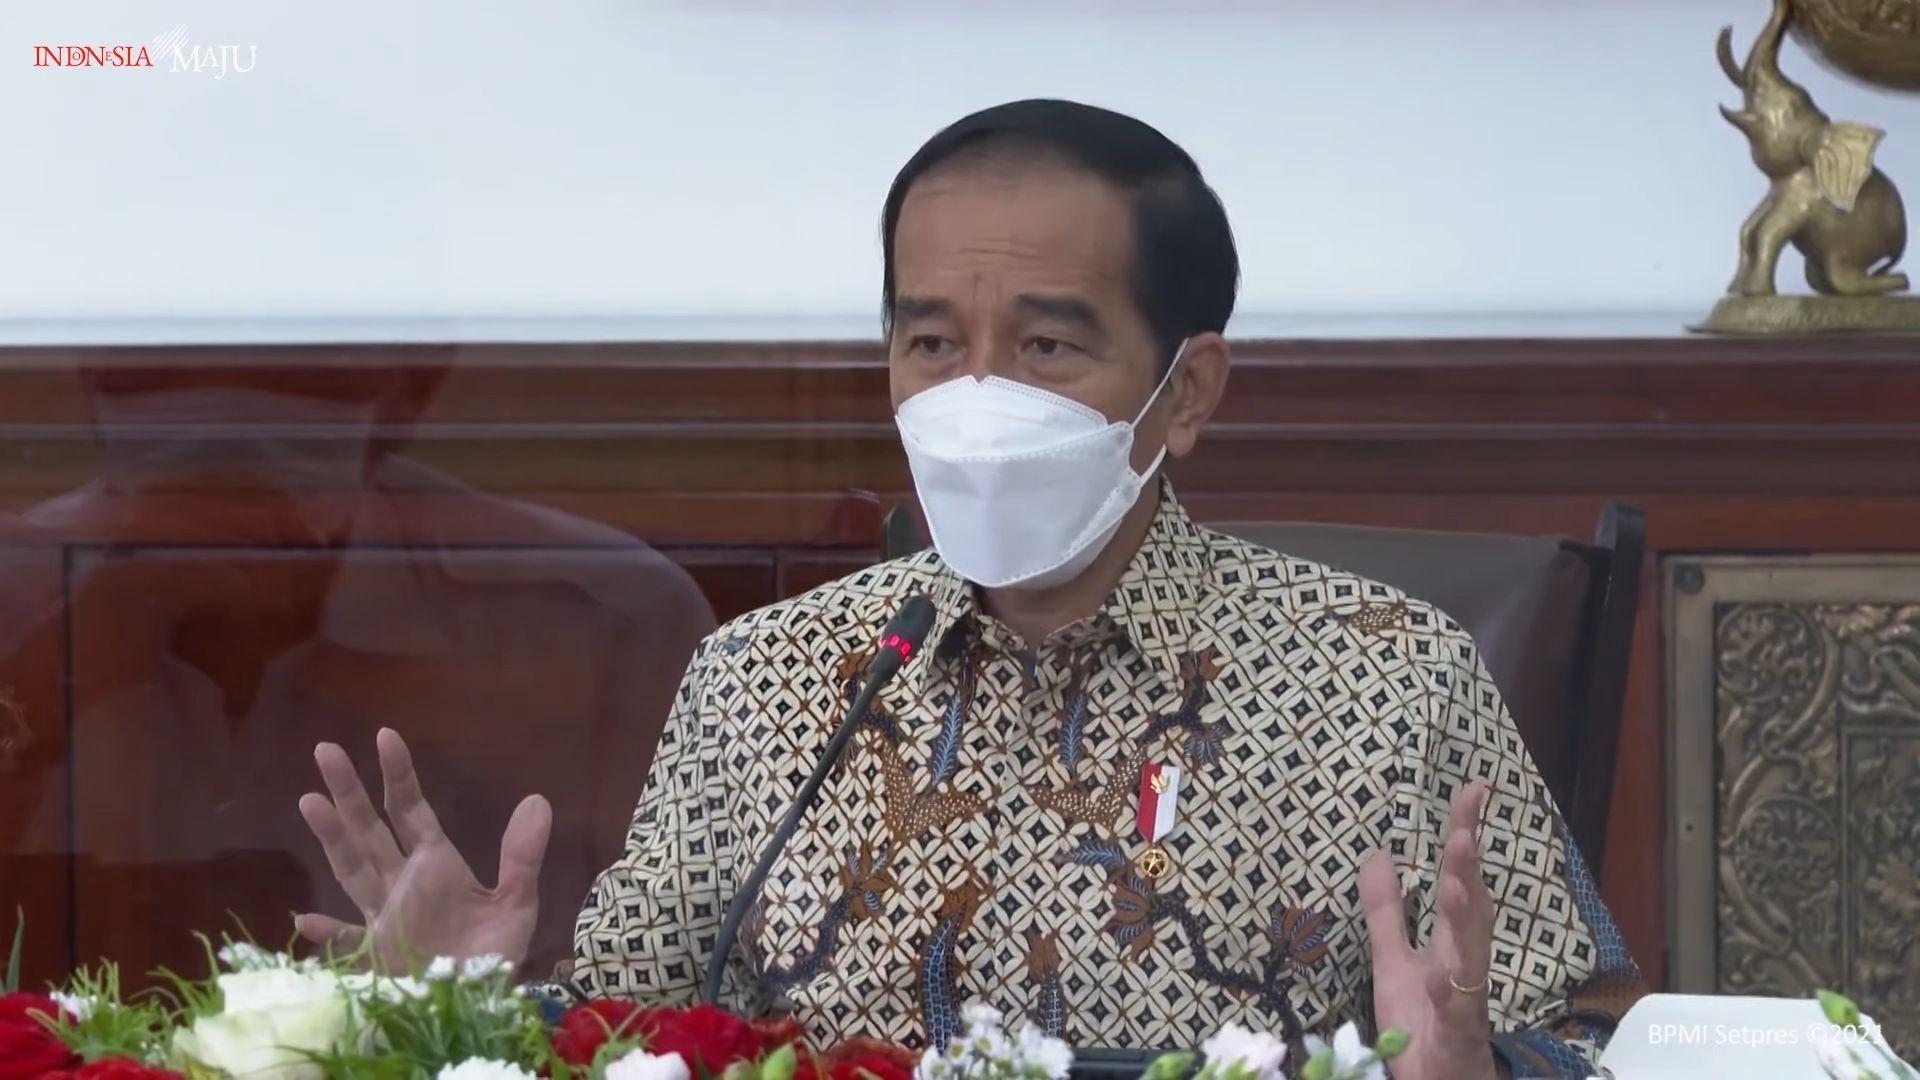 Presiden Joko Widodo memakai masker dan kemeja batik dalam rapat terbatas tentang penanganan COVID-19